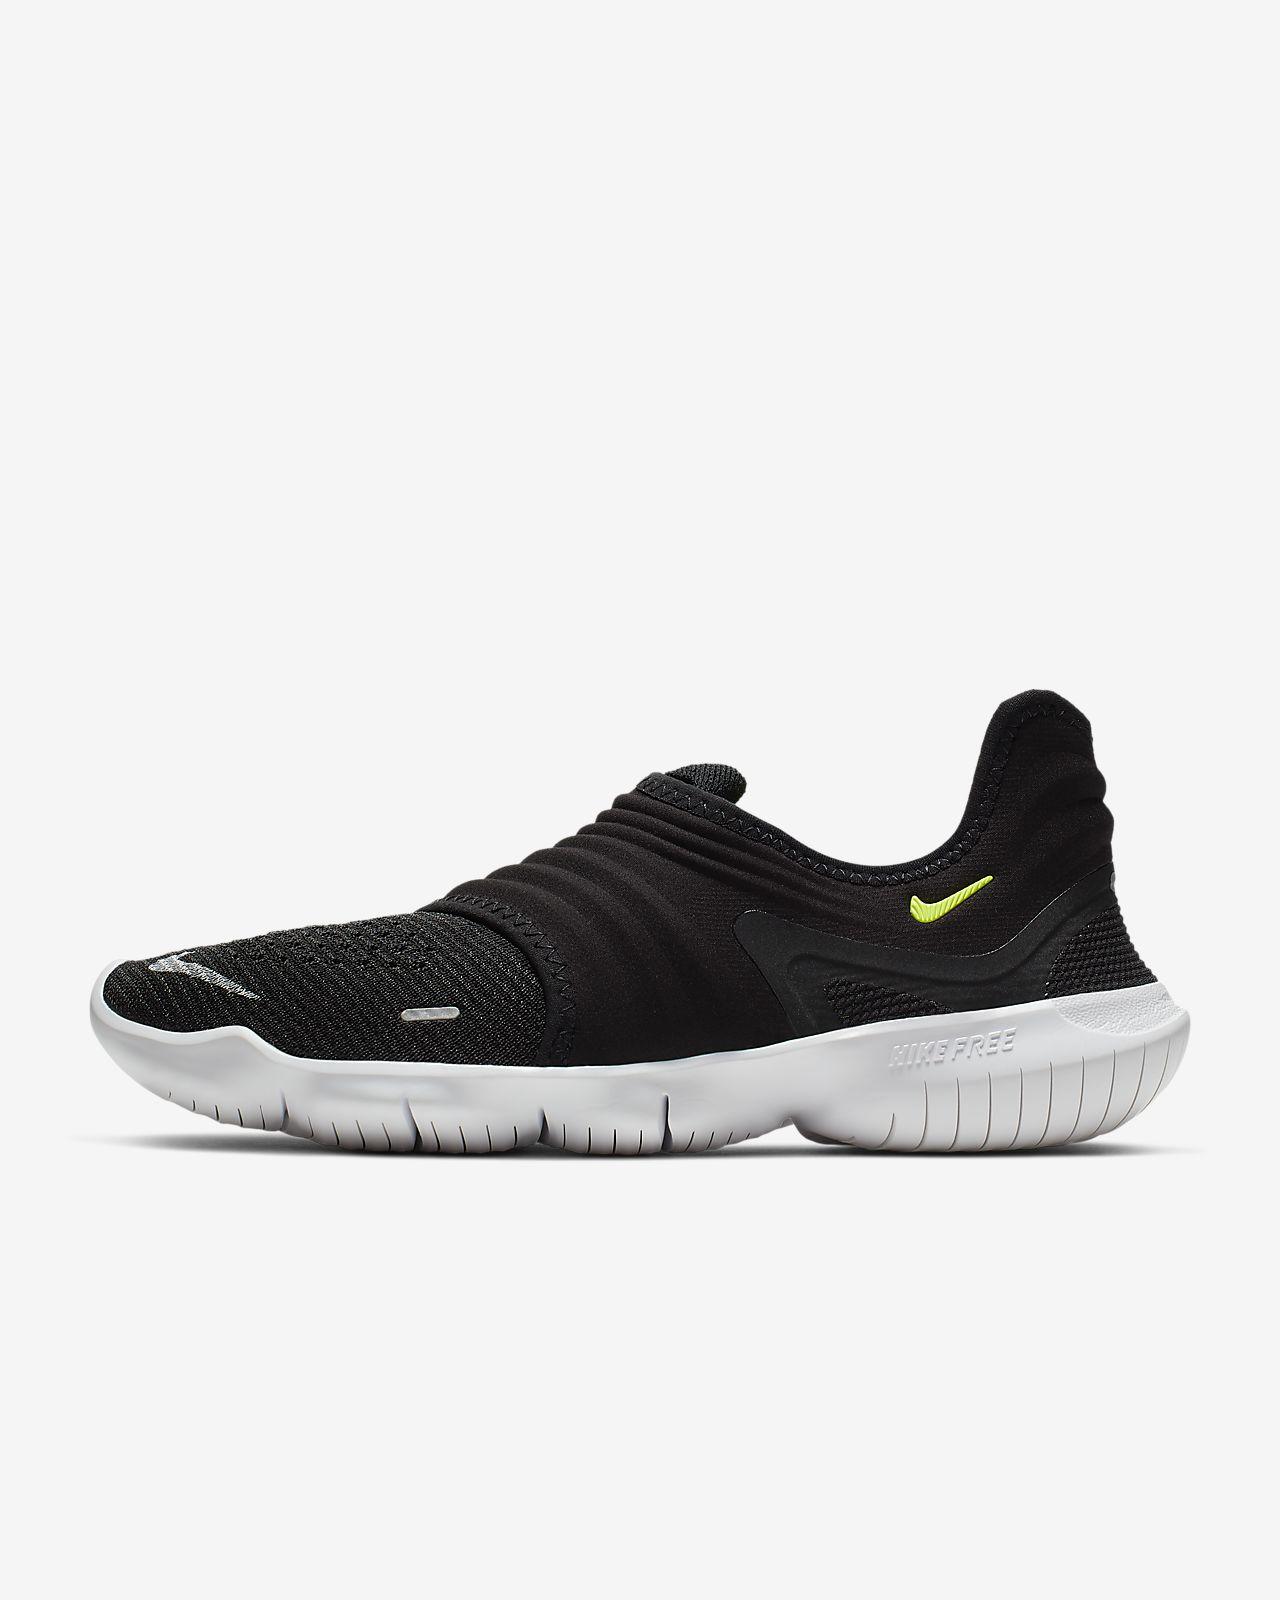 Nike Free 3.0 V3 Femme Chaussures Noir Blanc €50.99 | Nike